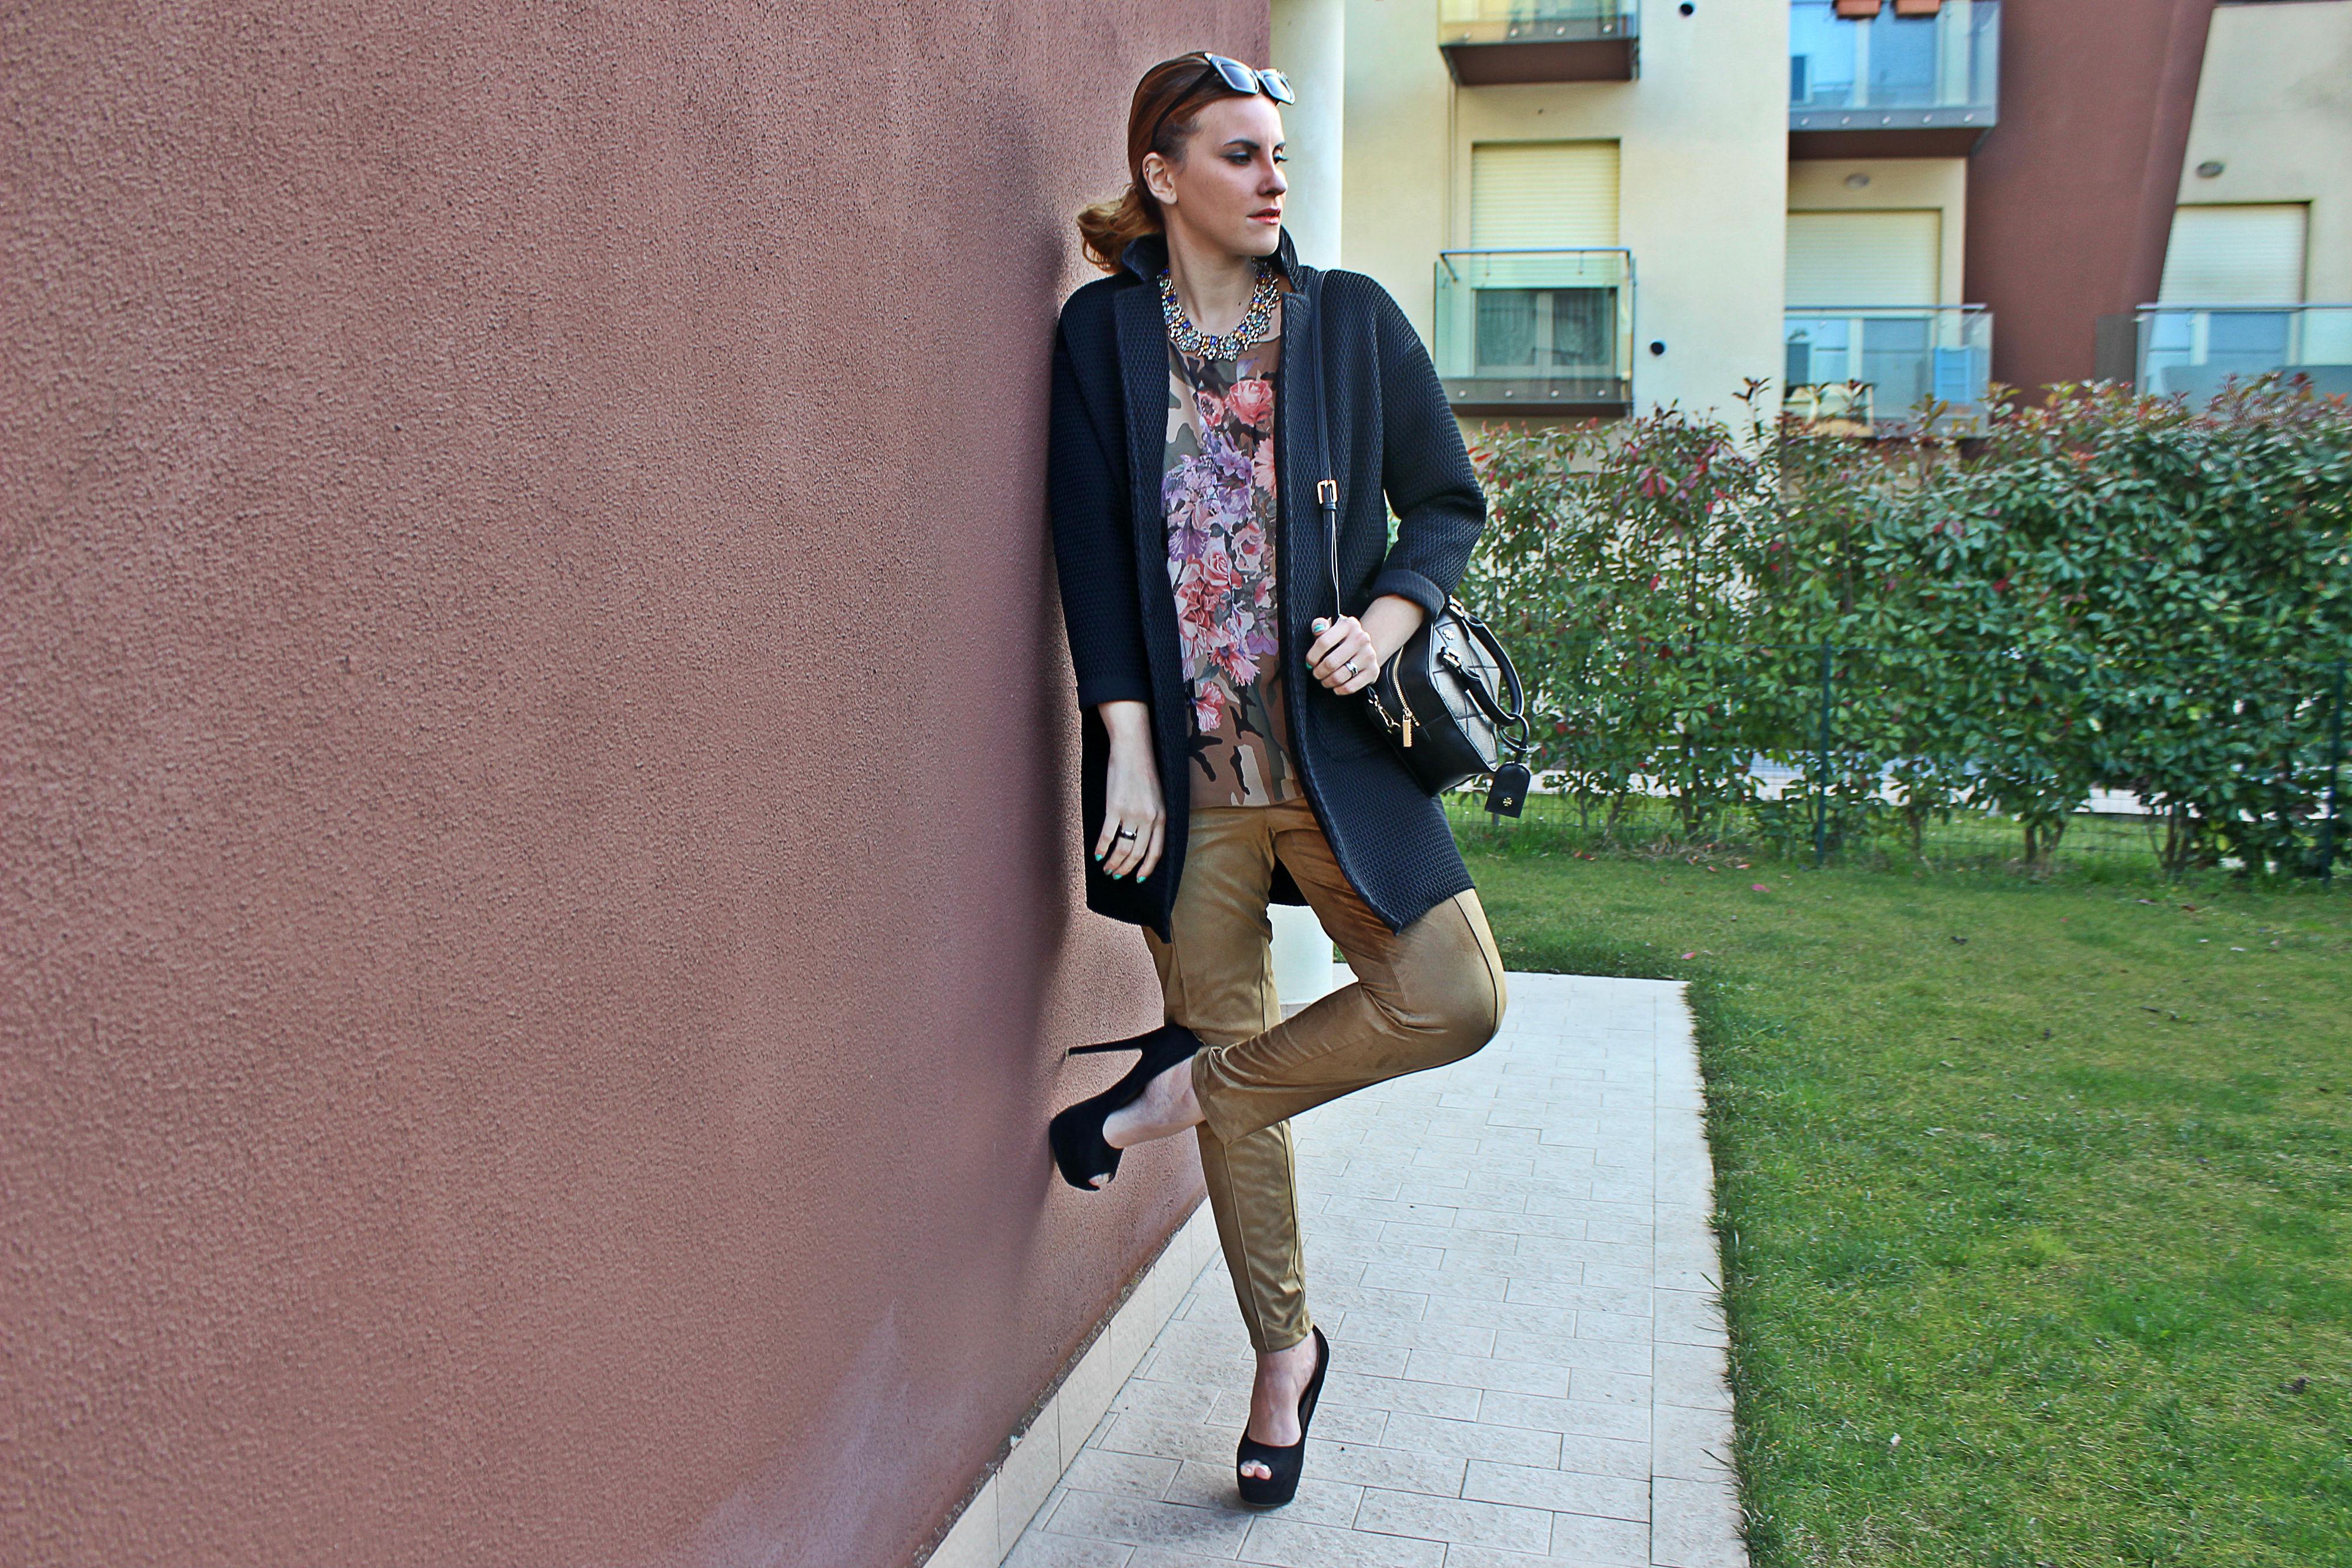 ME MALANDRINA BY ELISA LANDRI SS2015 - MODAfashion Fashion Blog Mag ... ff3d5e775a0